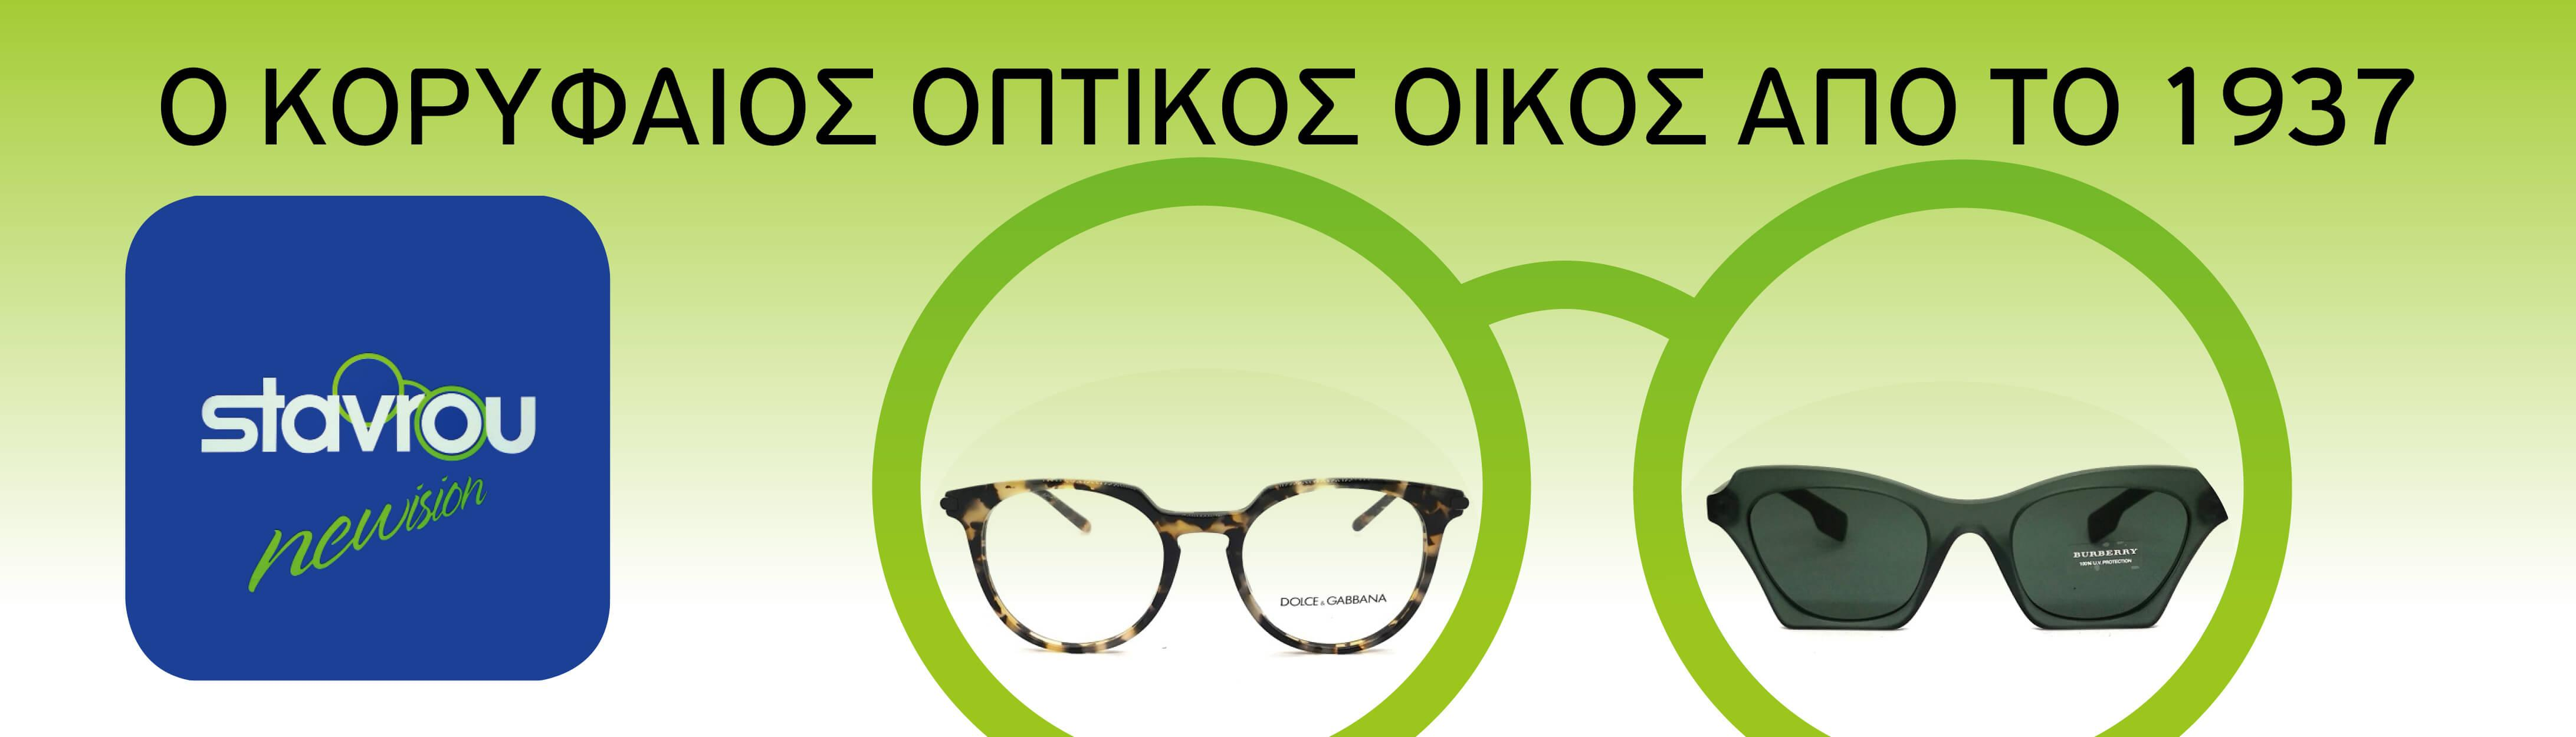 Stavrou New Vision | Οπτικά Καταστήματα